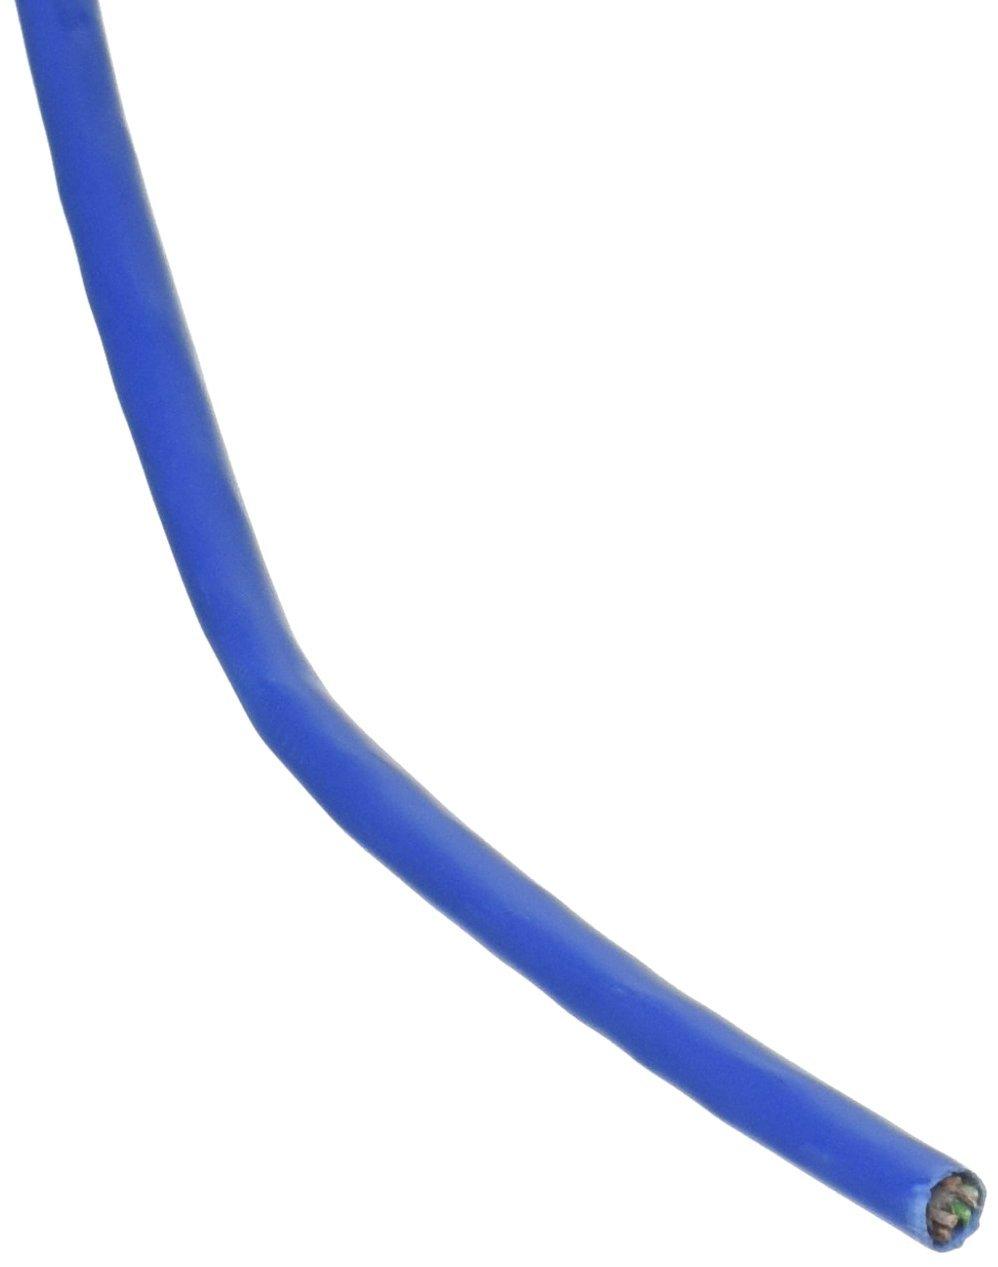 250FT Bulk CAT5E Blue Plnm Solid 24AWG Cable 4PR